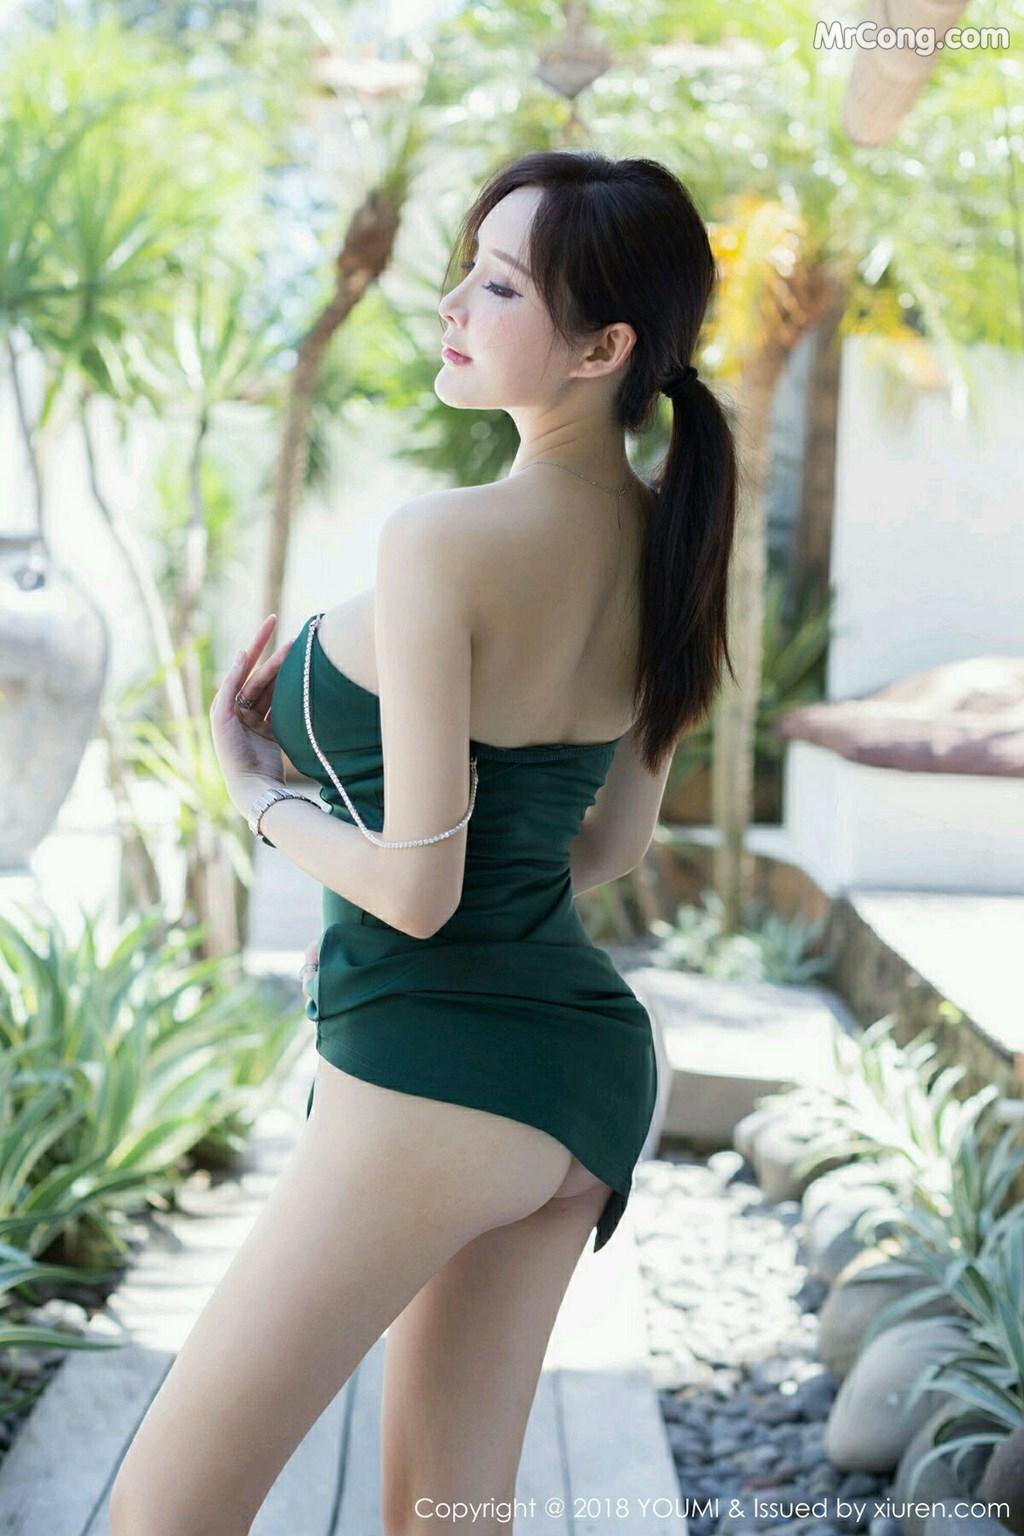 Image YouMi-Vol.188-Tu-Fei-Yuan-Ai-Cuo-Qiong-MrCong.com-021 in post YouMi Vol.188: Người mẫu 奶瓶土肥圆 (52 ảnh)